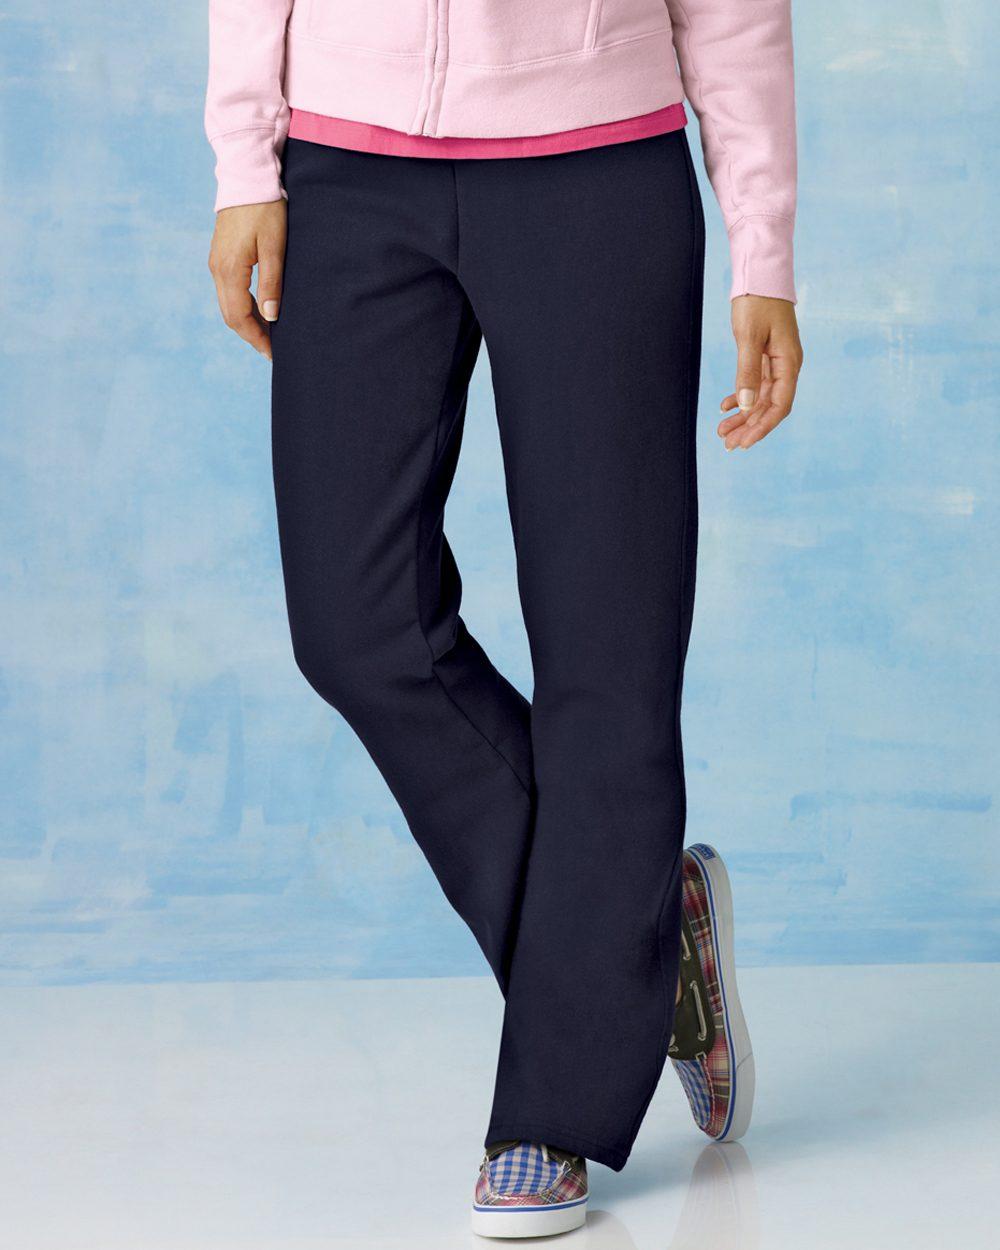 Hanes W550 - Ladies' ComfortBlend Ecosmart Sweatpants